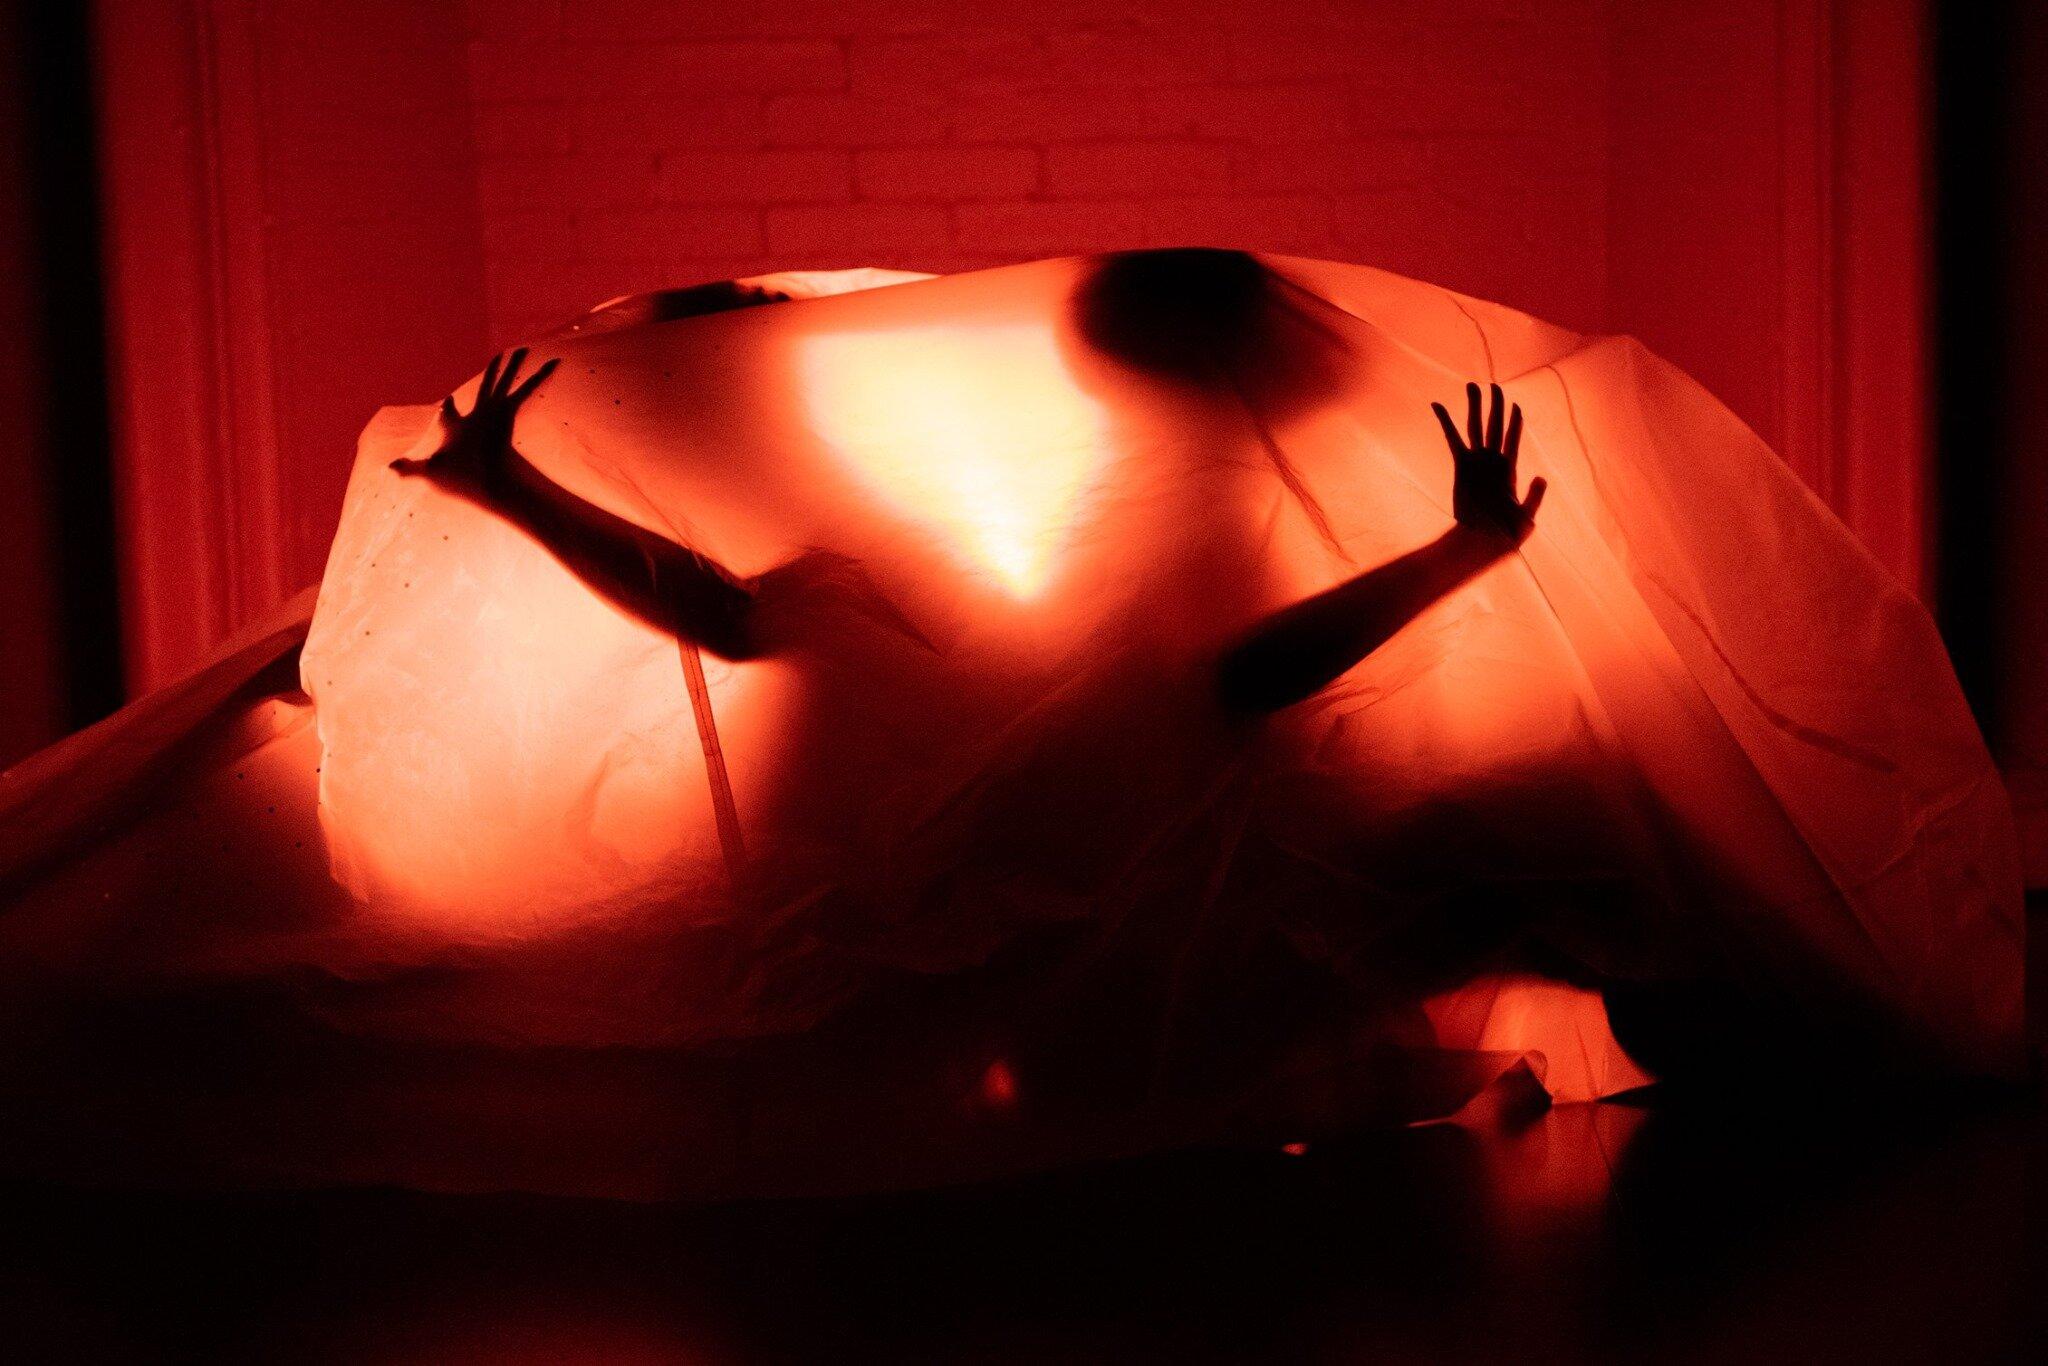 benjisun presents bodyssey at Yale Cabaret, October 3-5, 2019 (photos by Blaq Pearl Photography)